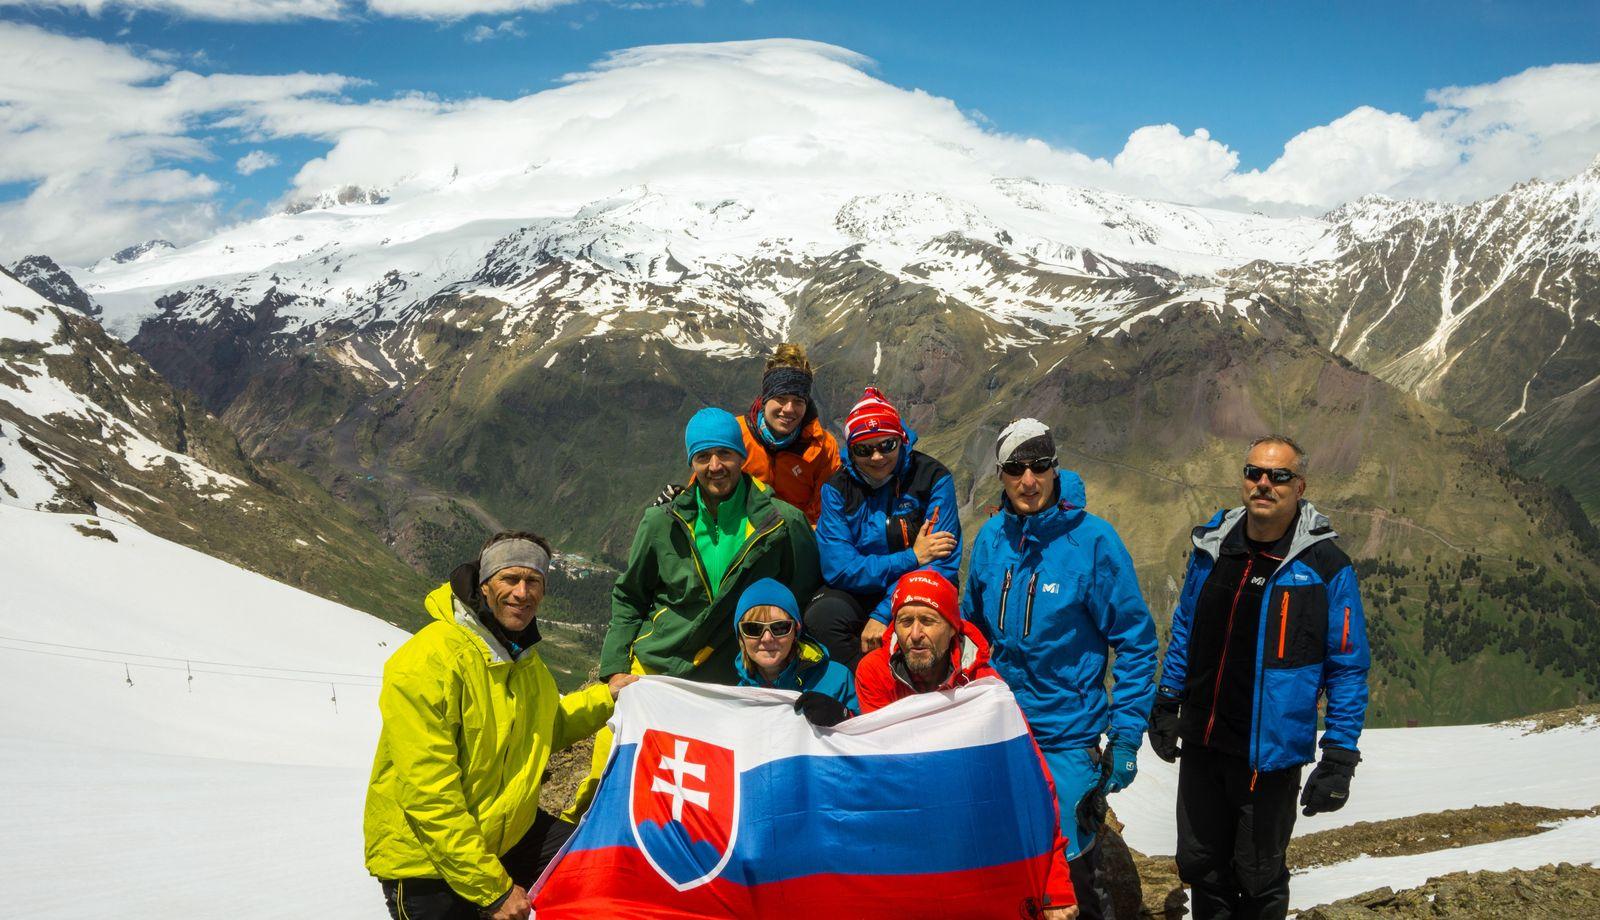 Na Čegete, v pozadí Elbrus / foto Matúš Jančura